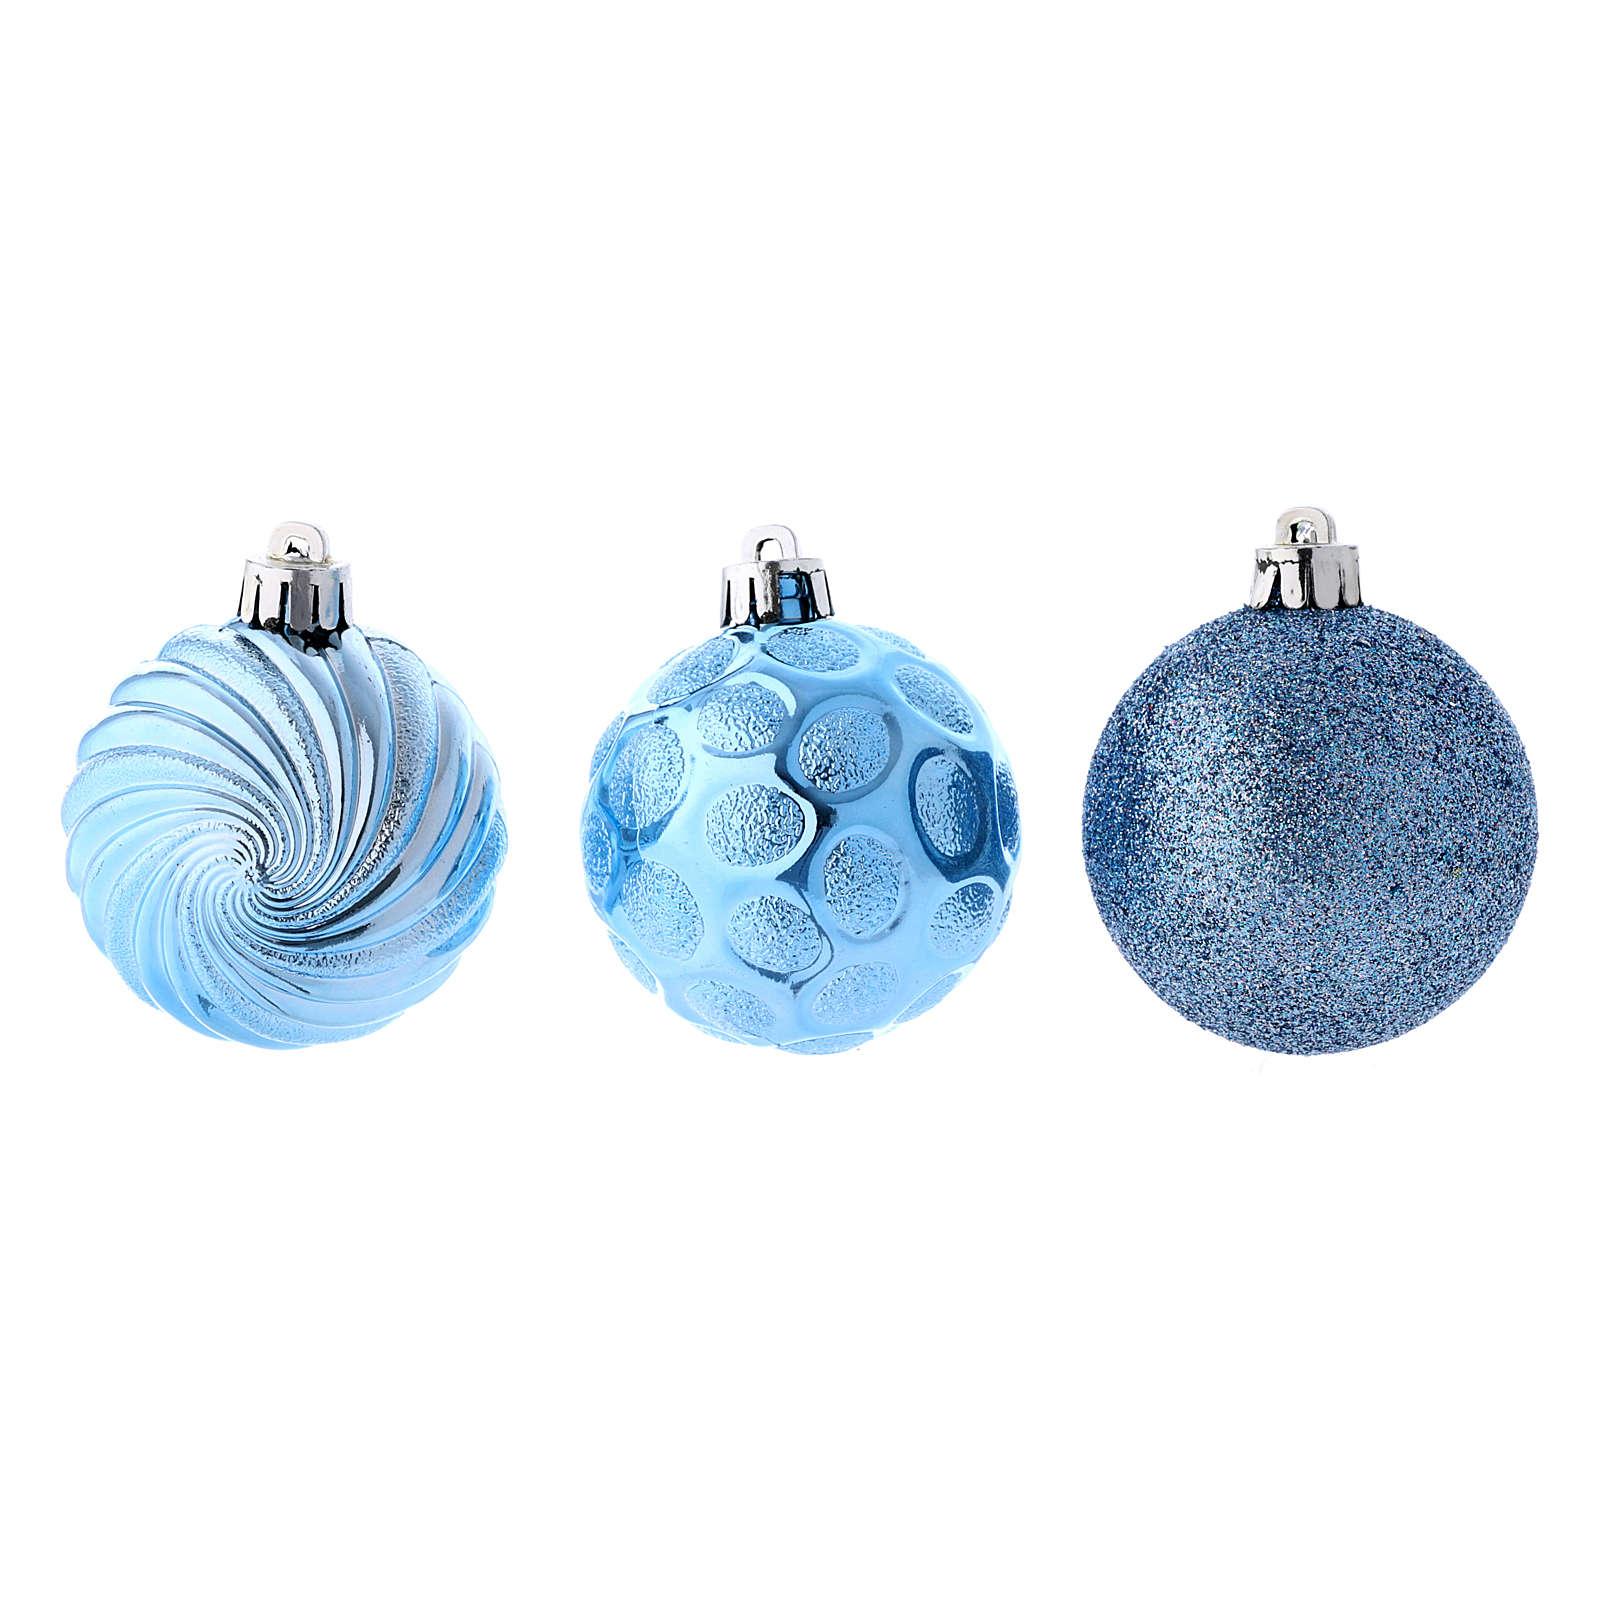 Boules Sapin Noël bleu 60 mm (vendu par 12) 4